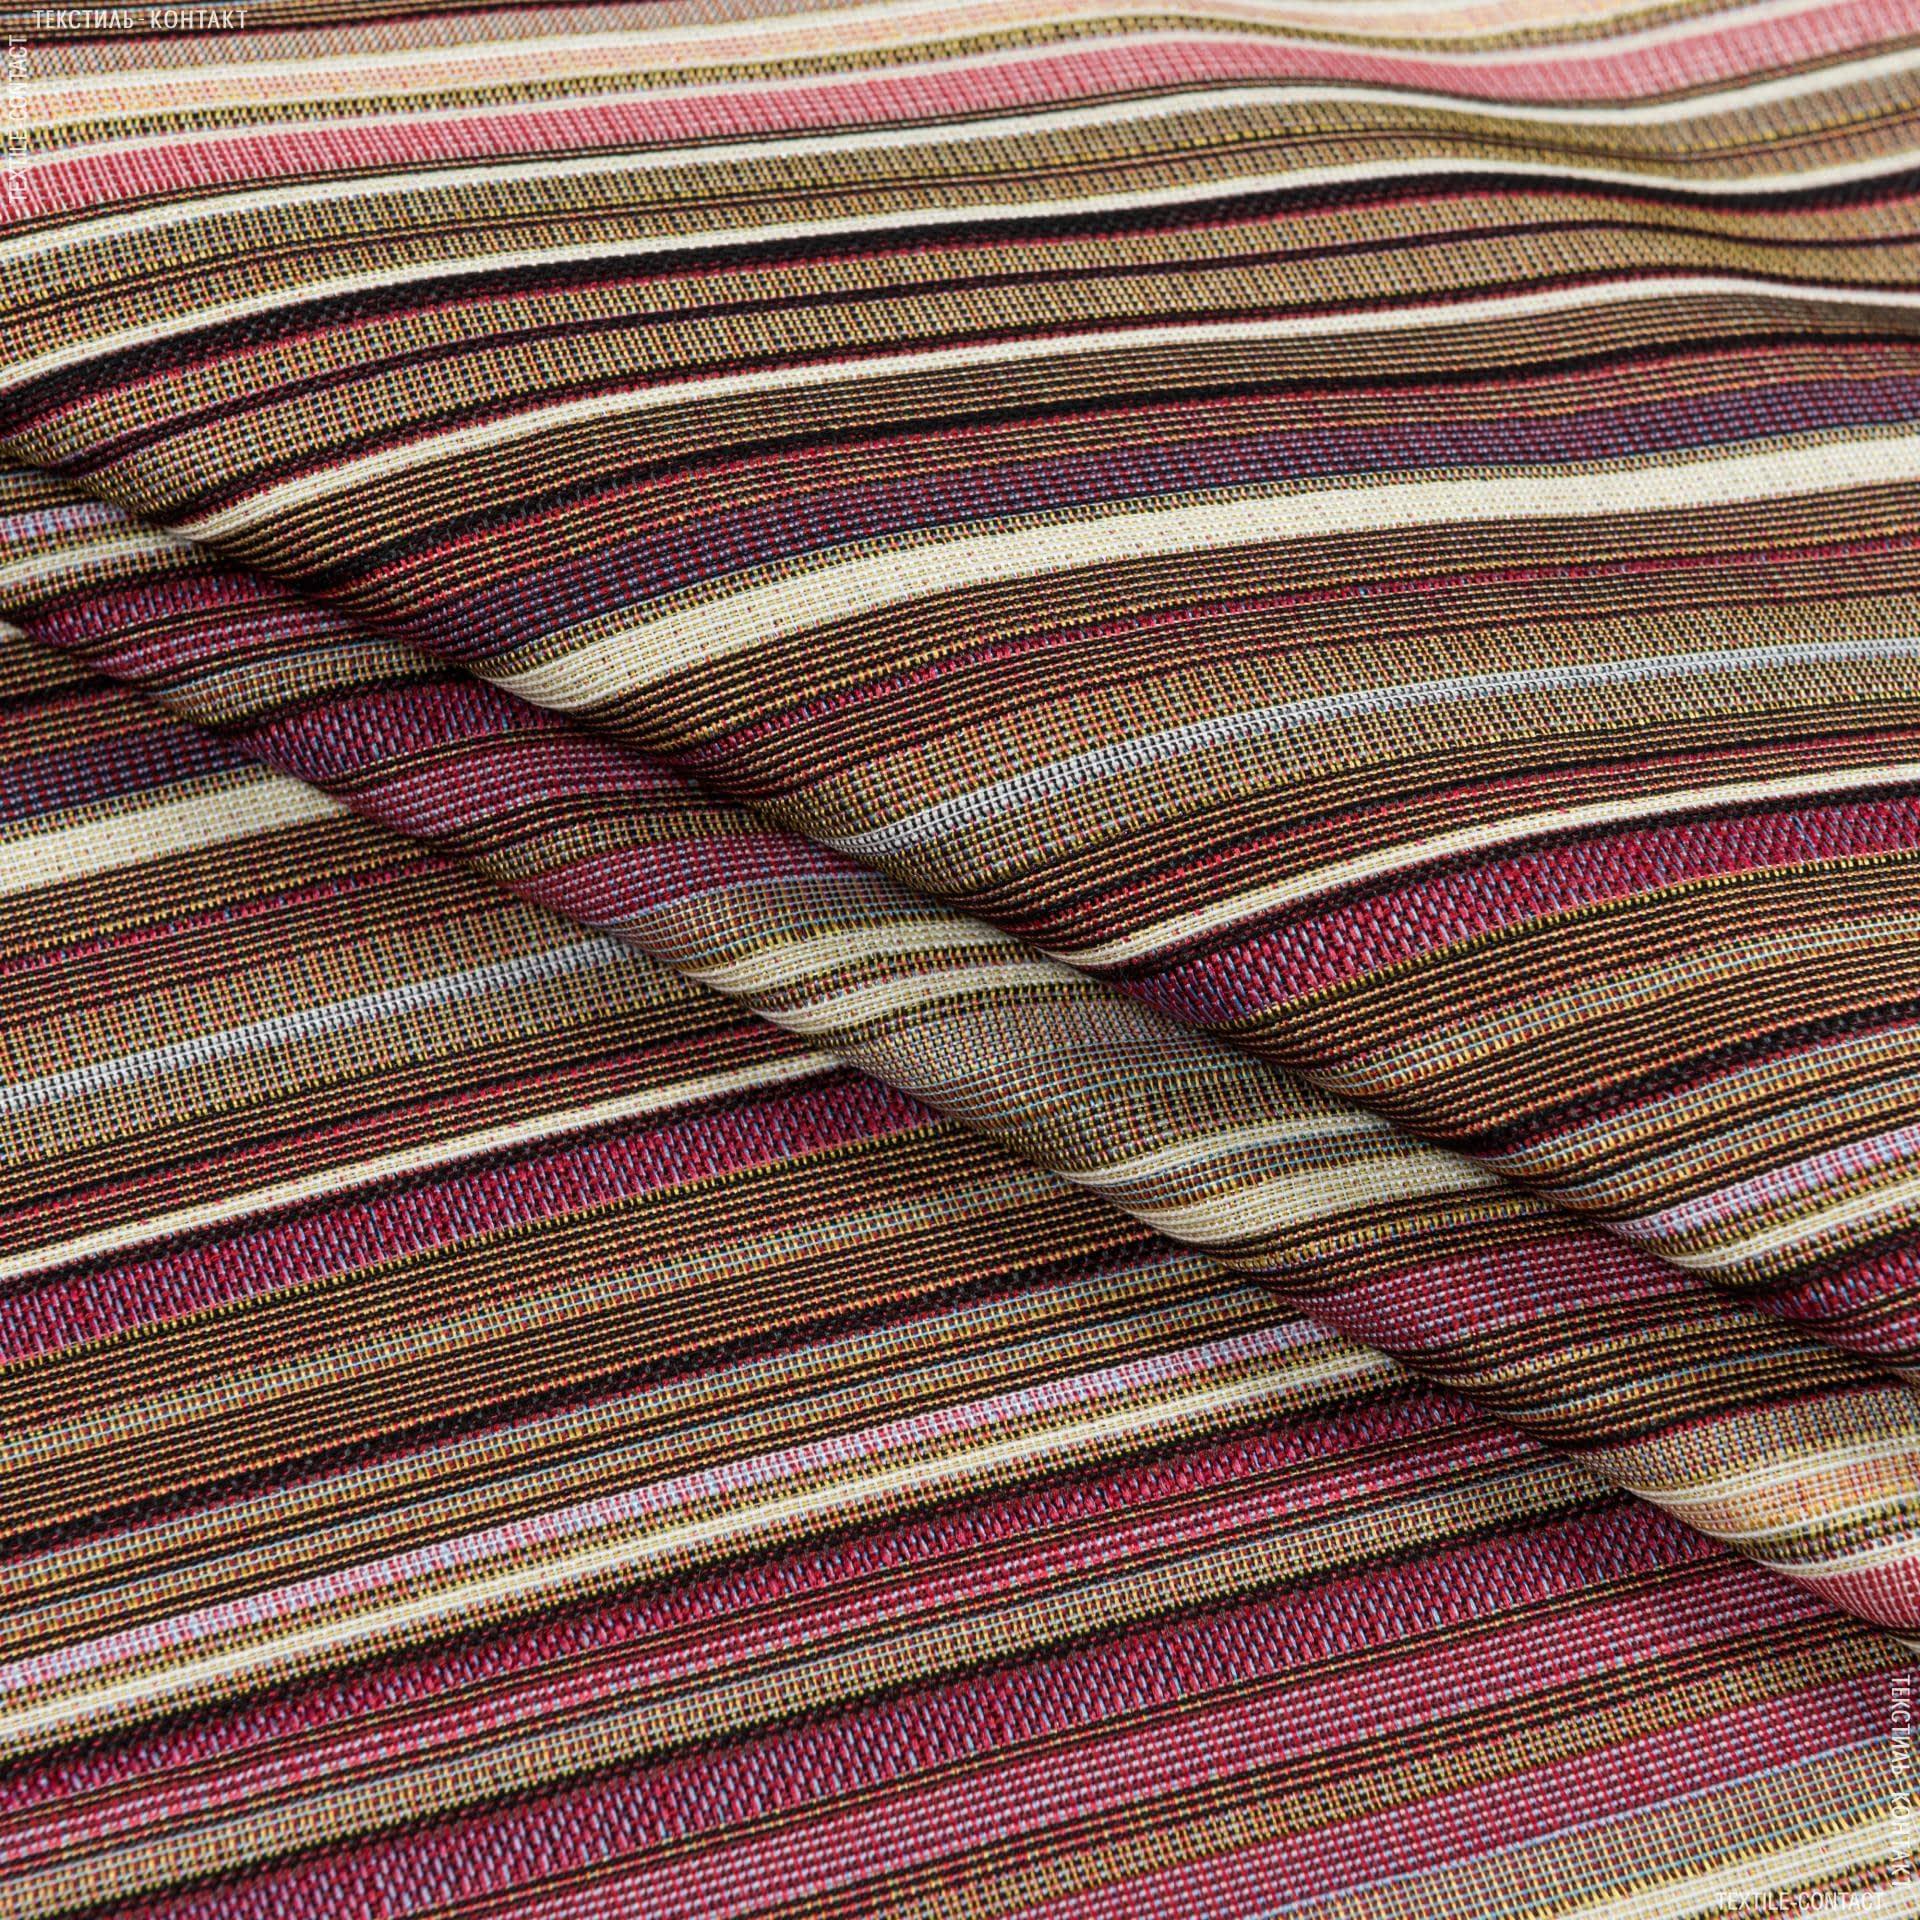 Ткани для декоративных подушек - Декор-гобелен   полоса расол/rasol  коричевый фрез беж